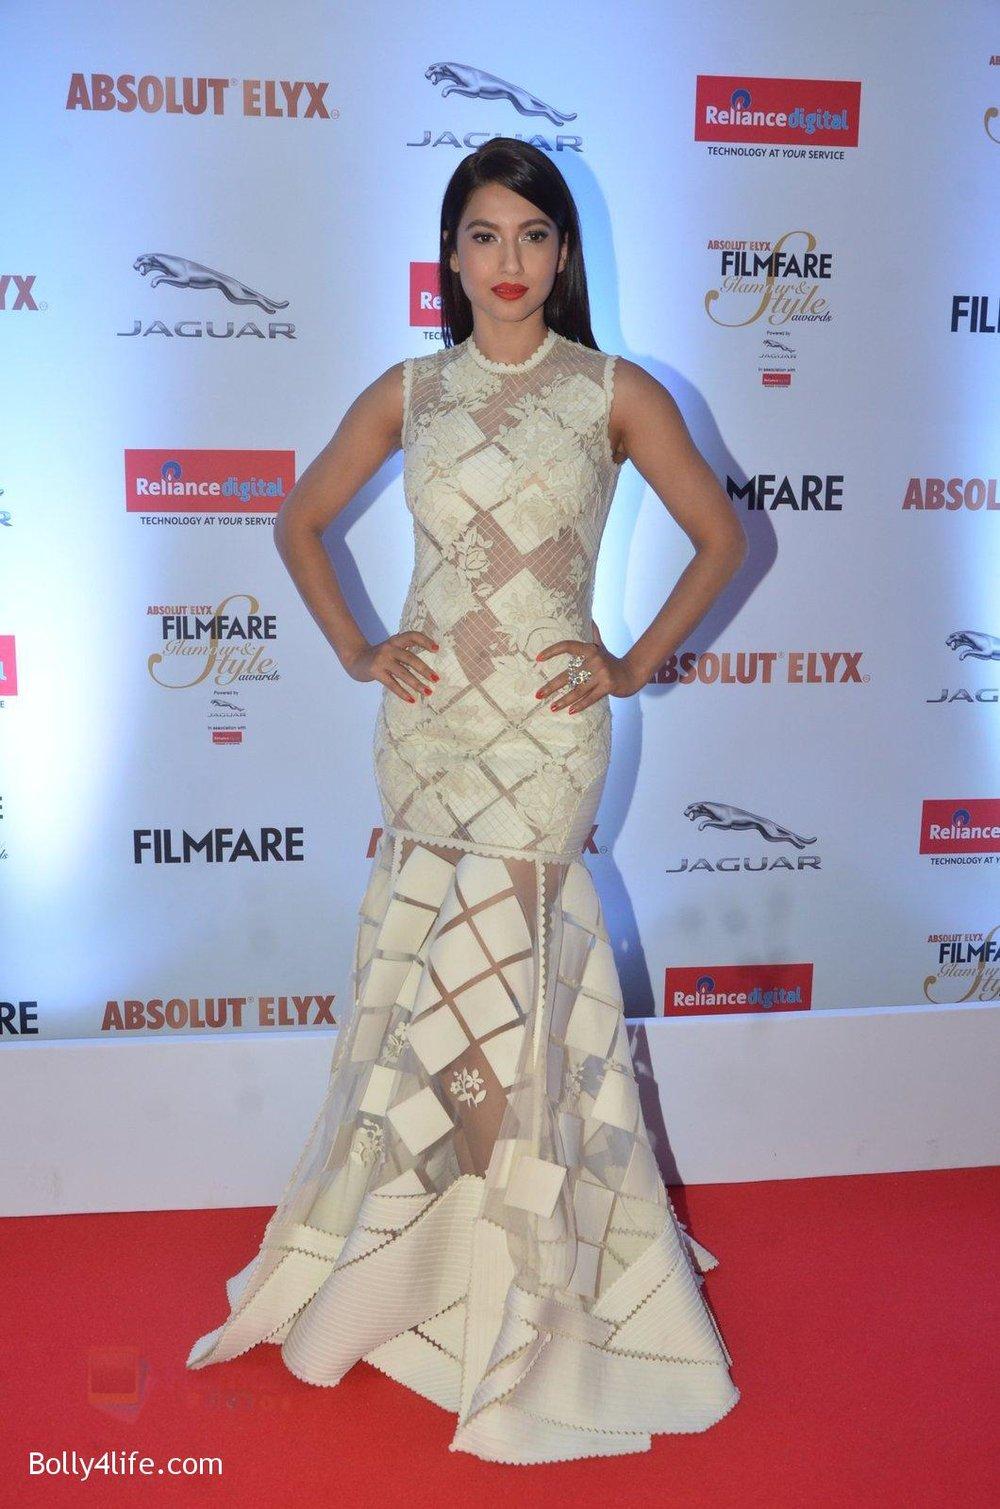 Gauhar-Khan-at-Filmfare-Glamour-Style-Awards-2016-in-Mumbai-on-15th-Oct-2016-1137.jpg